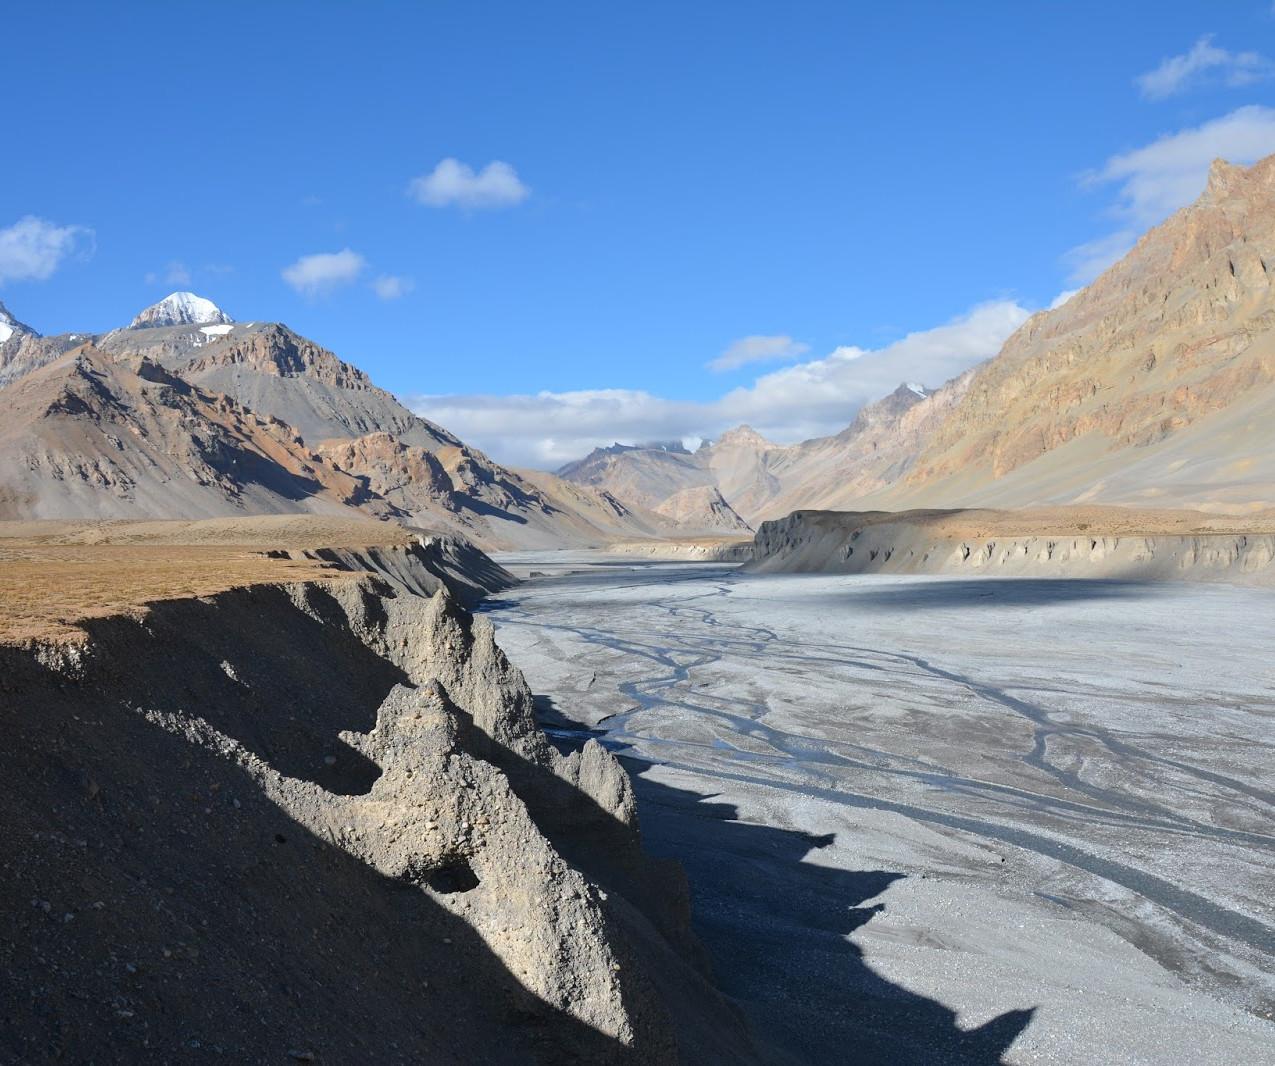 Ladakh-Spiti-2016-DSC_5837